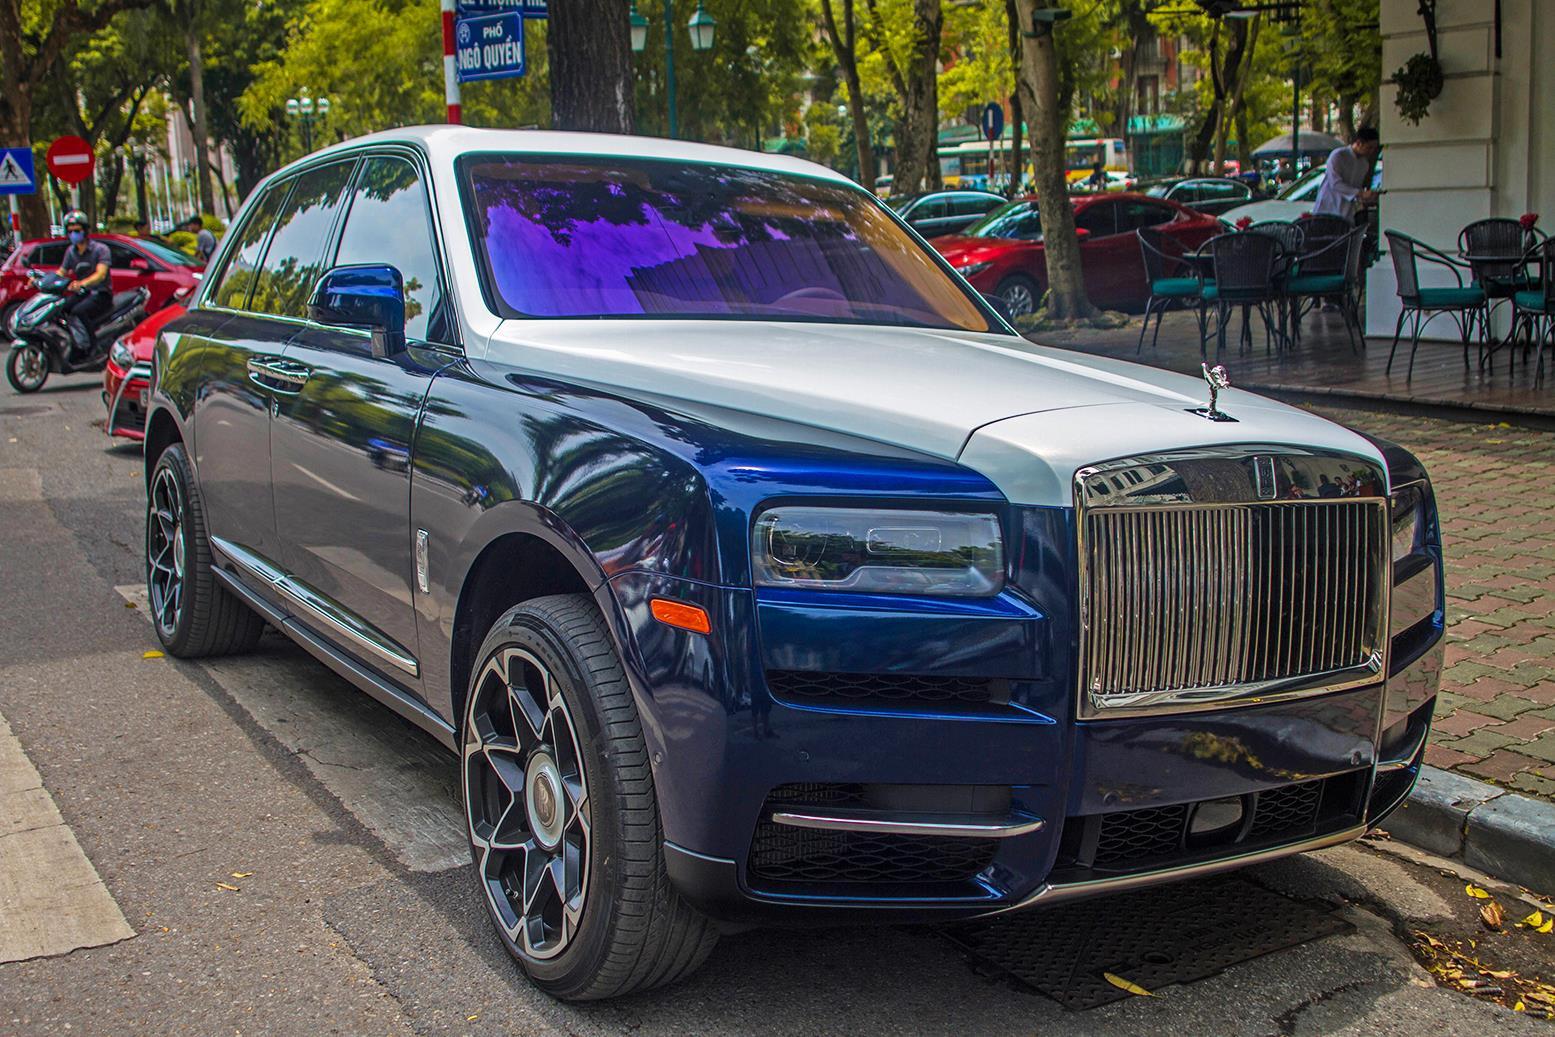 Bo doi SUV sieu sang Rolls-Royce Cullinan lan dau 'dung do' tai Ha Noi hinh anh 4